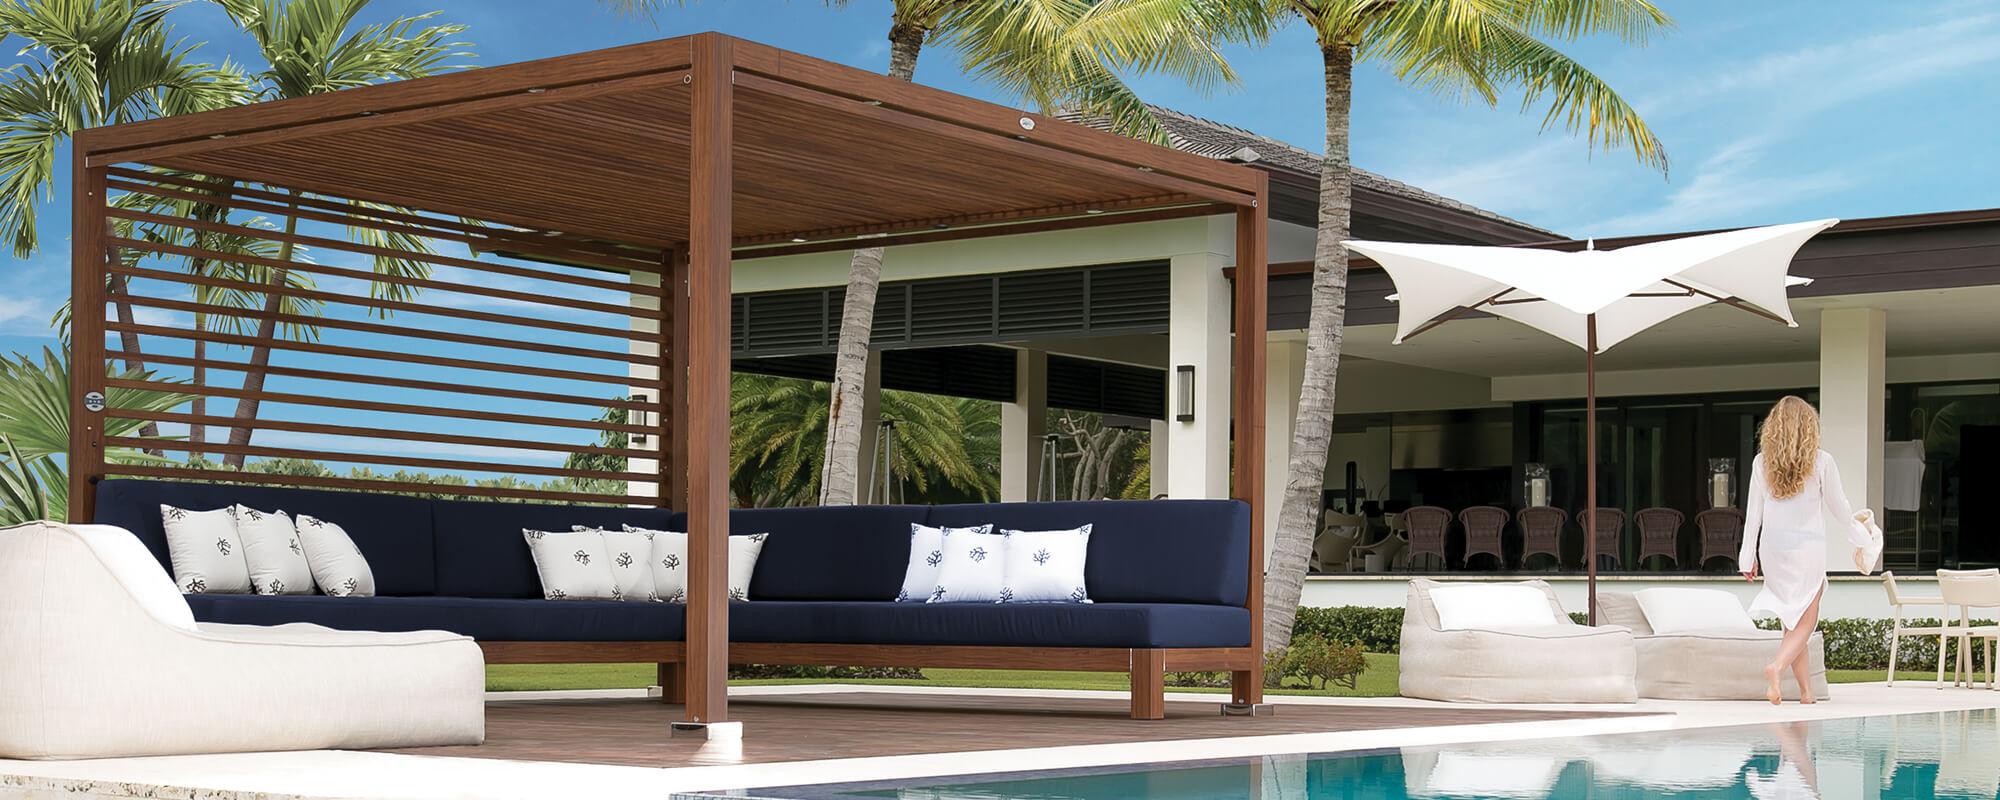 Outdoor Cabana tuuci equinox outdoor cabanas | tuuci